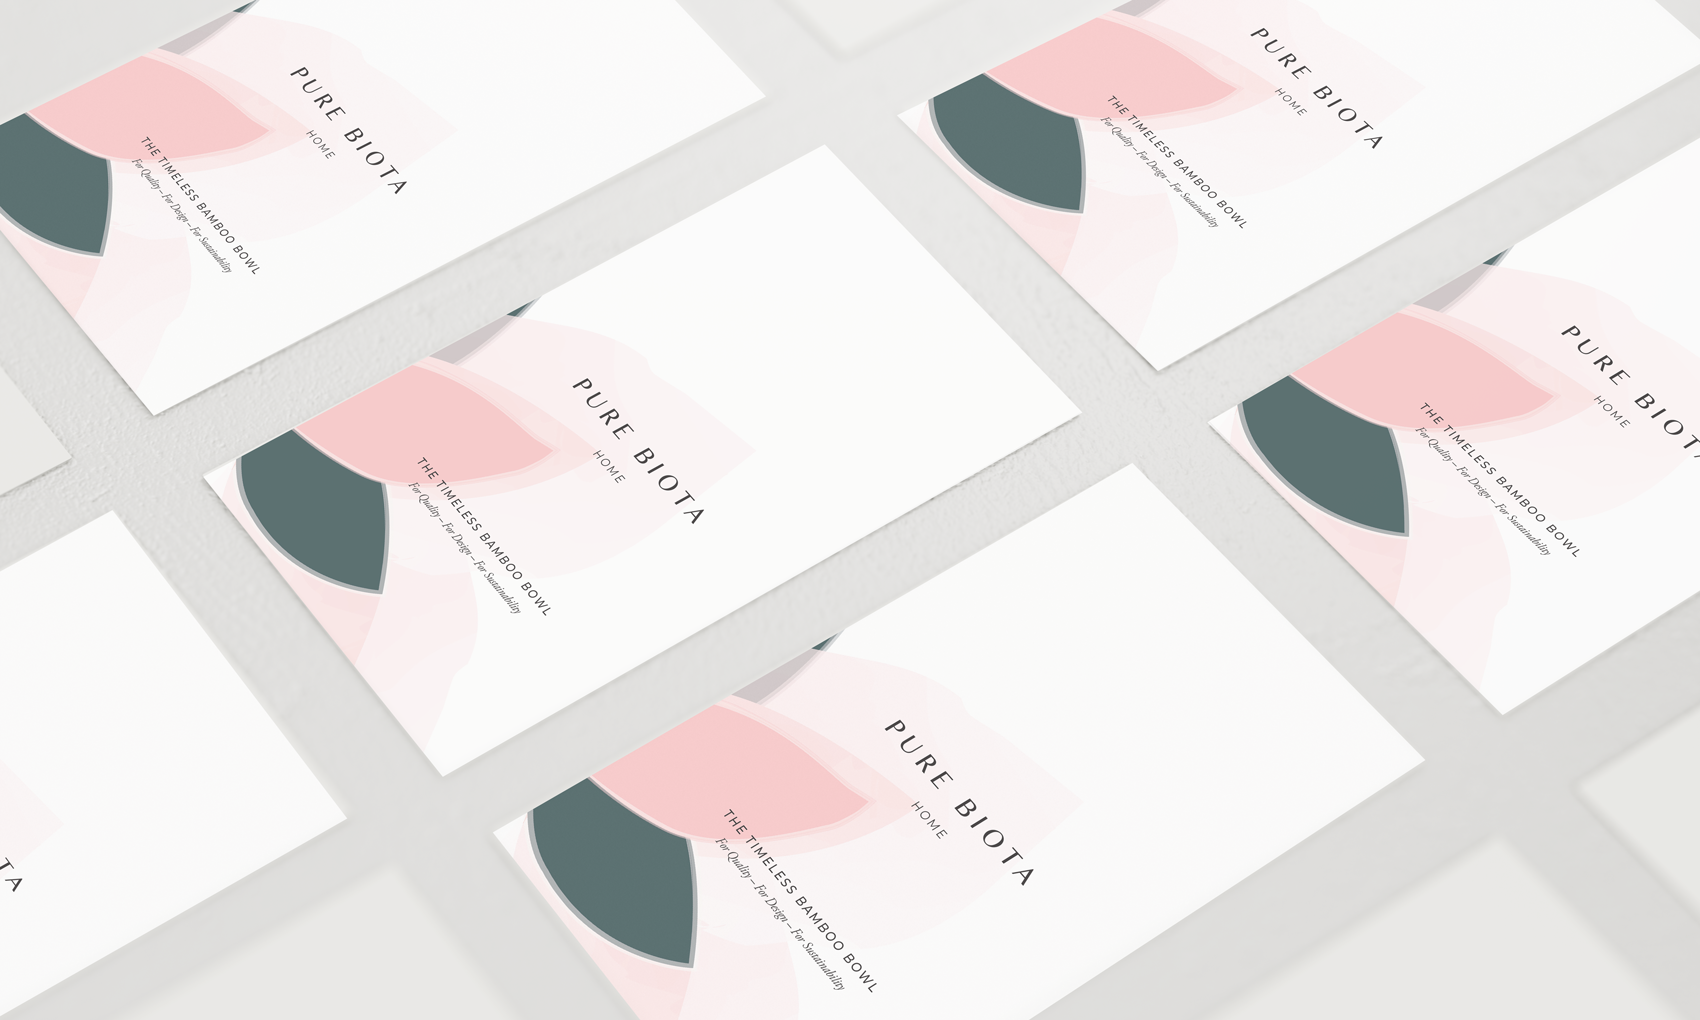 pure-biota-business-card.png